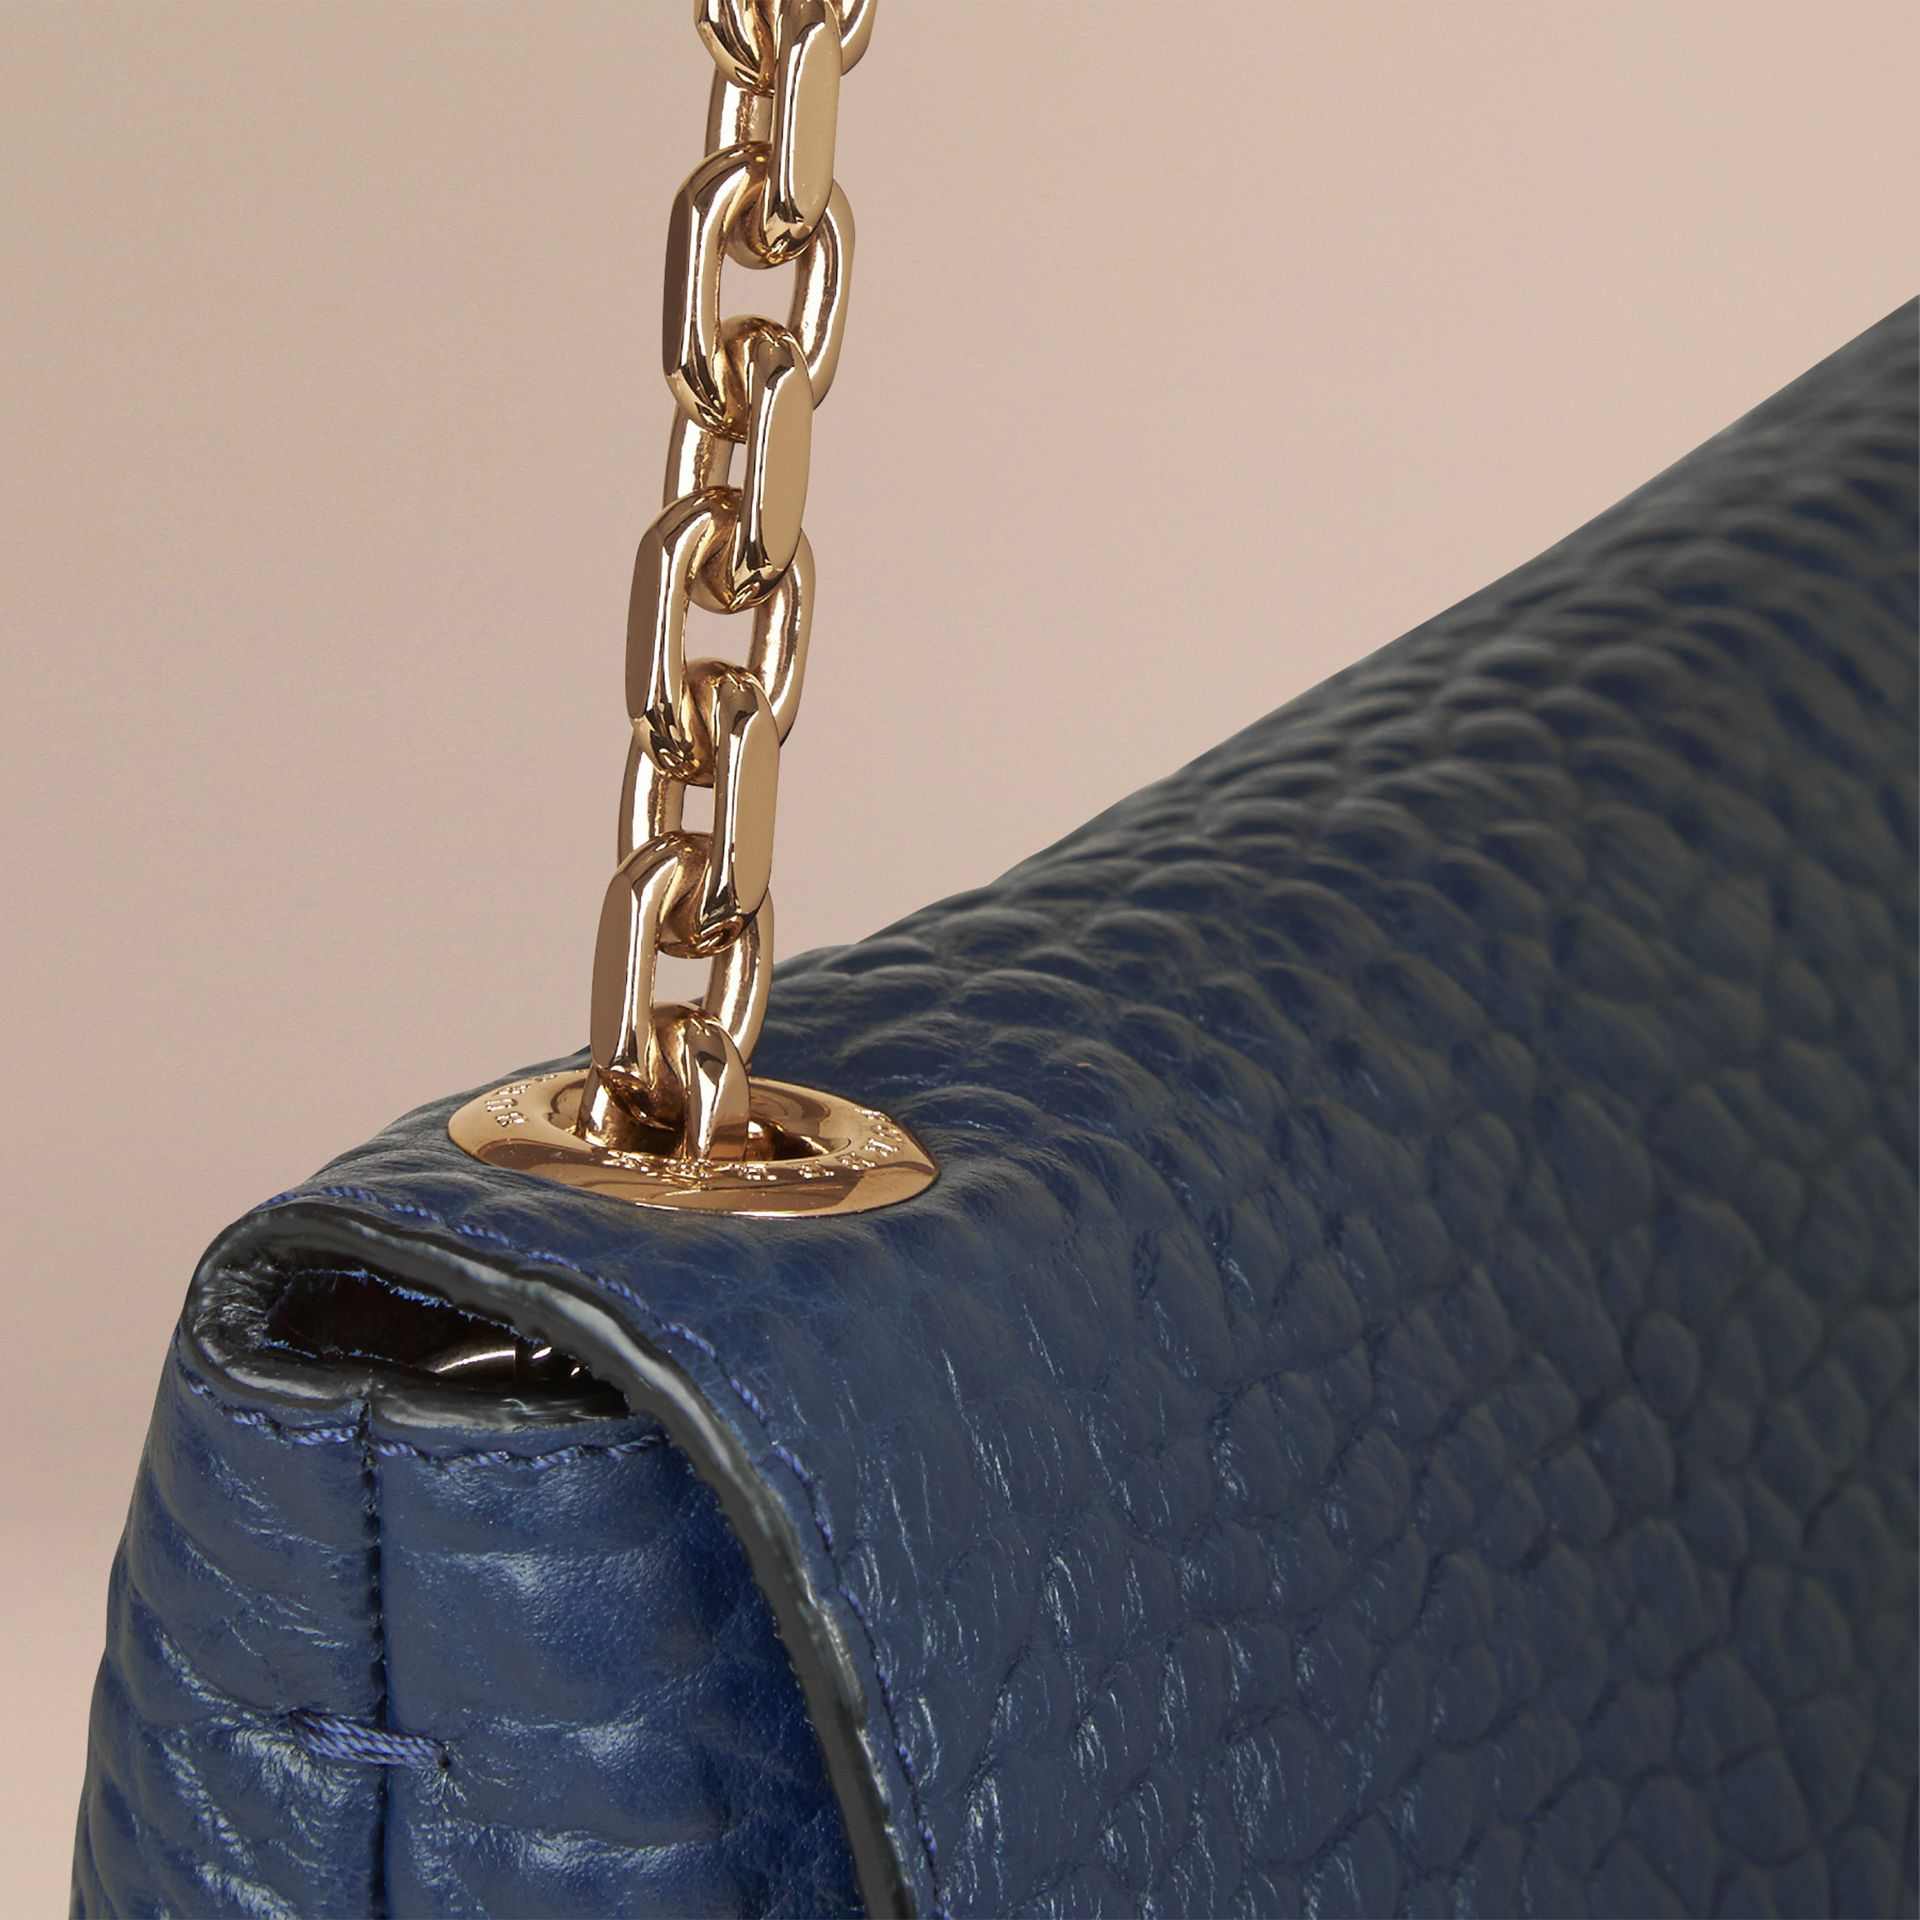 Carbonblau Große Schultertasche aus genarbtem Burberry-Leder Carbonblau - Galerie-Bild 6